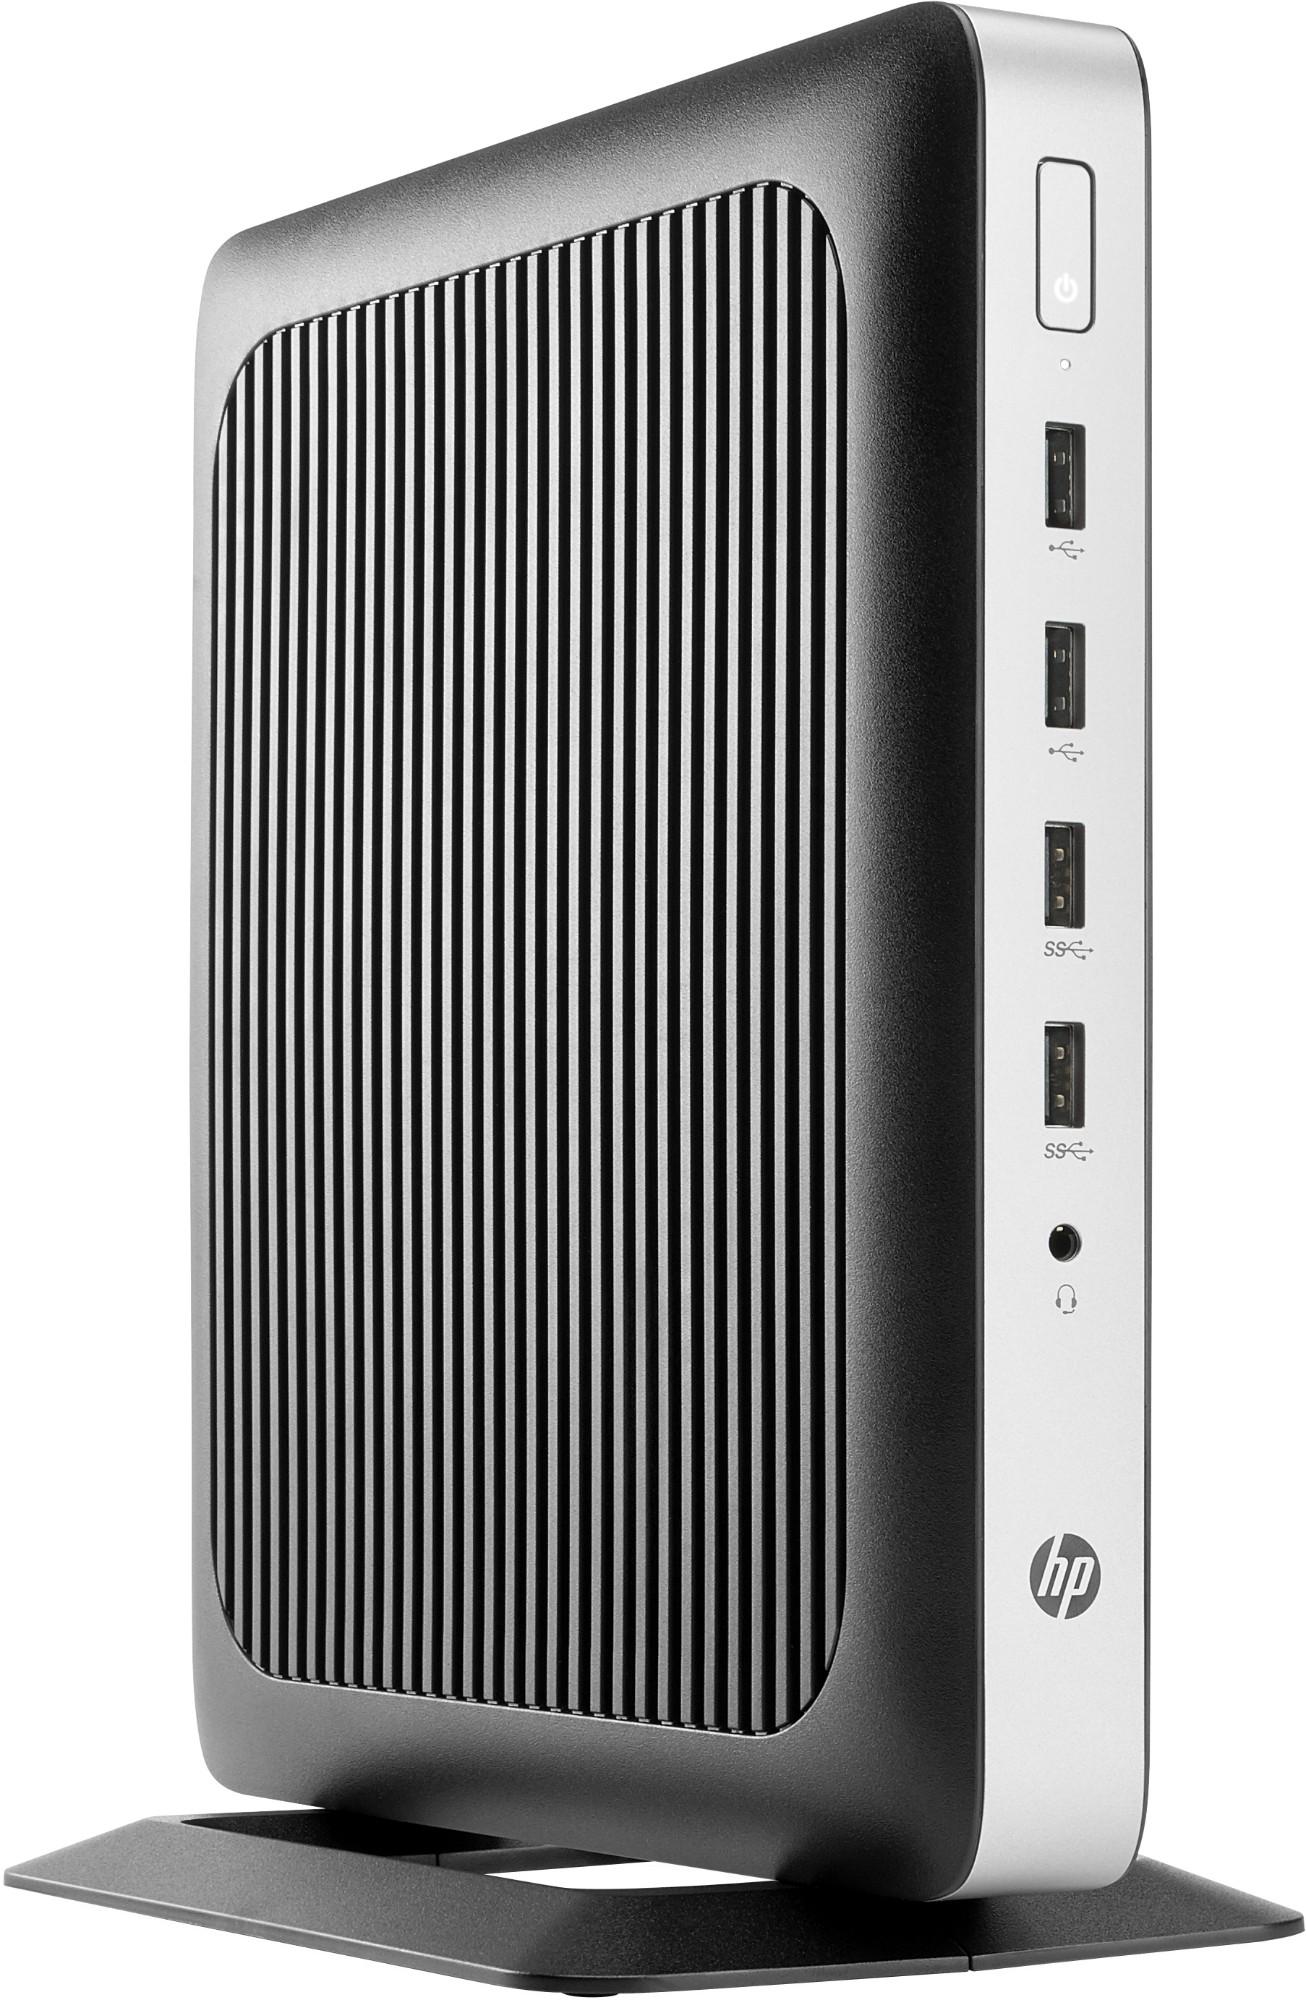 HP t630 Thin Client - AMD GX-420GI SoC -  32GB Flash 8GB RAM - Win10 IoT Ent - Qwerty UK